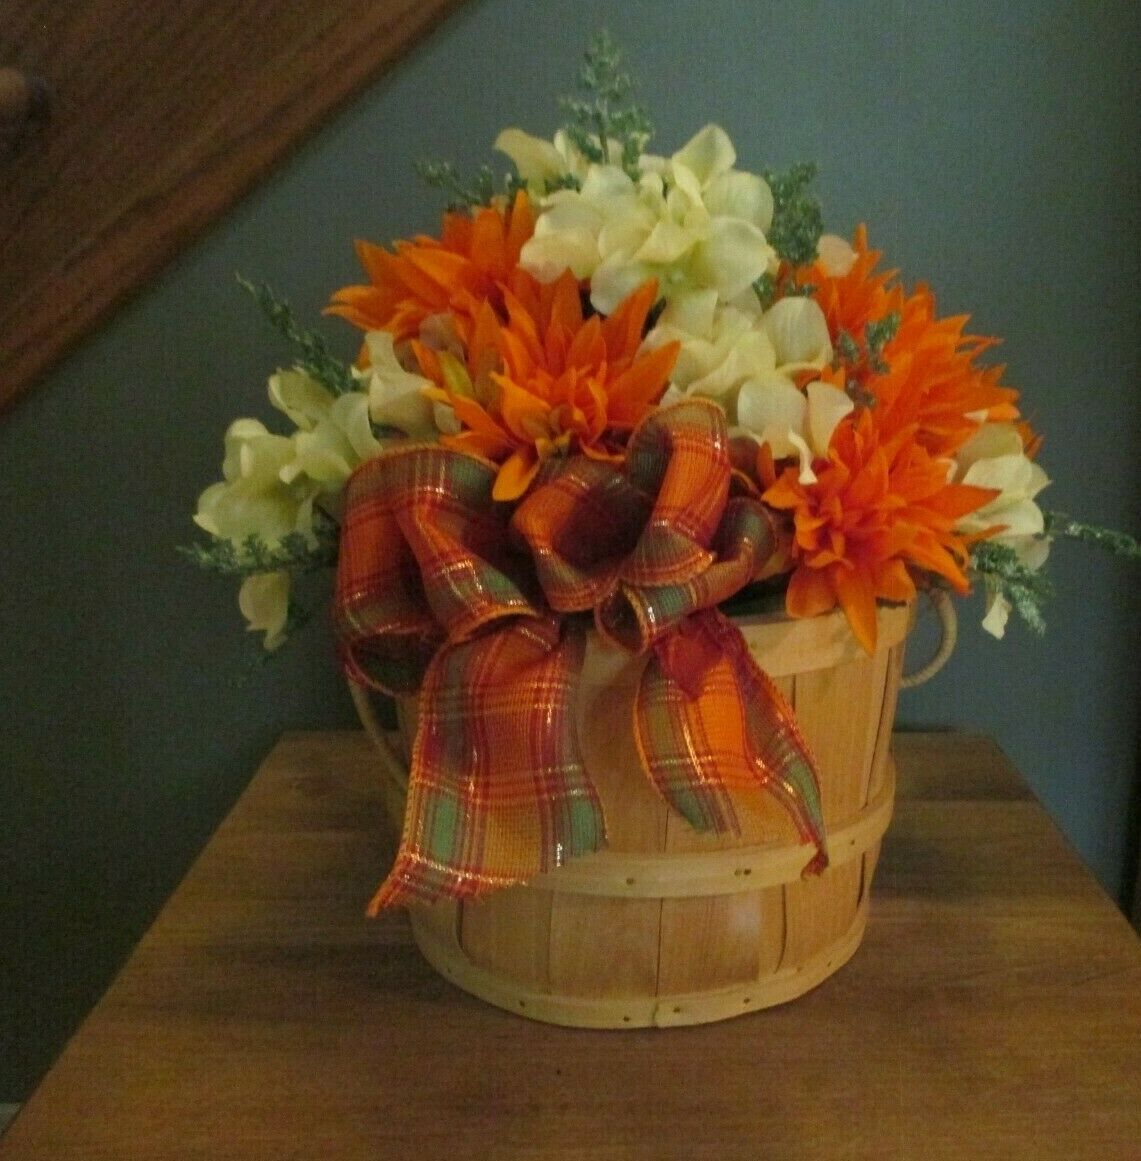 Handmade Fall Flower Arrangement In Basket Plaid Bow 12 H For Sale Online